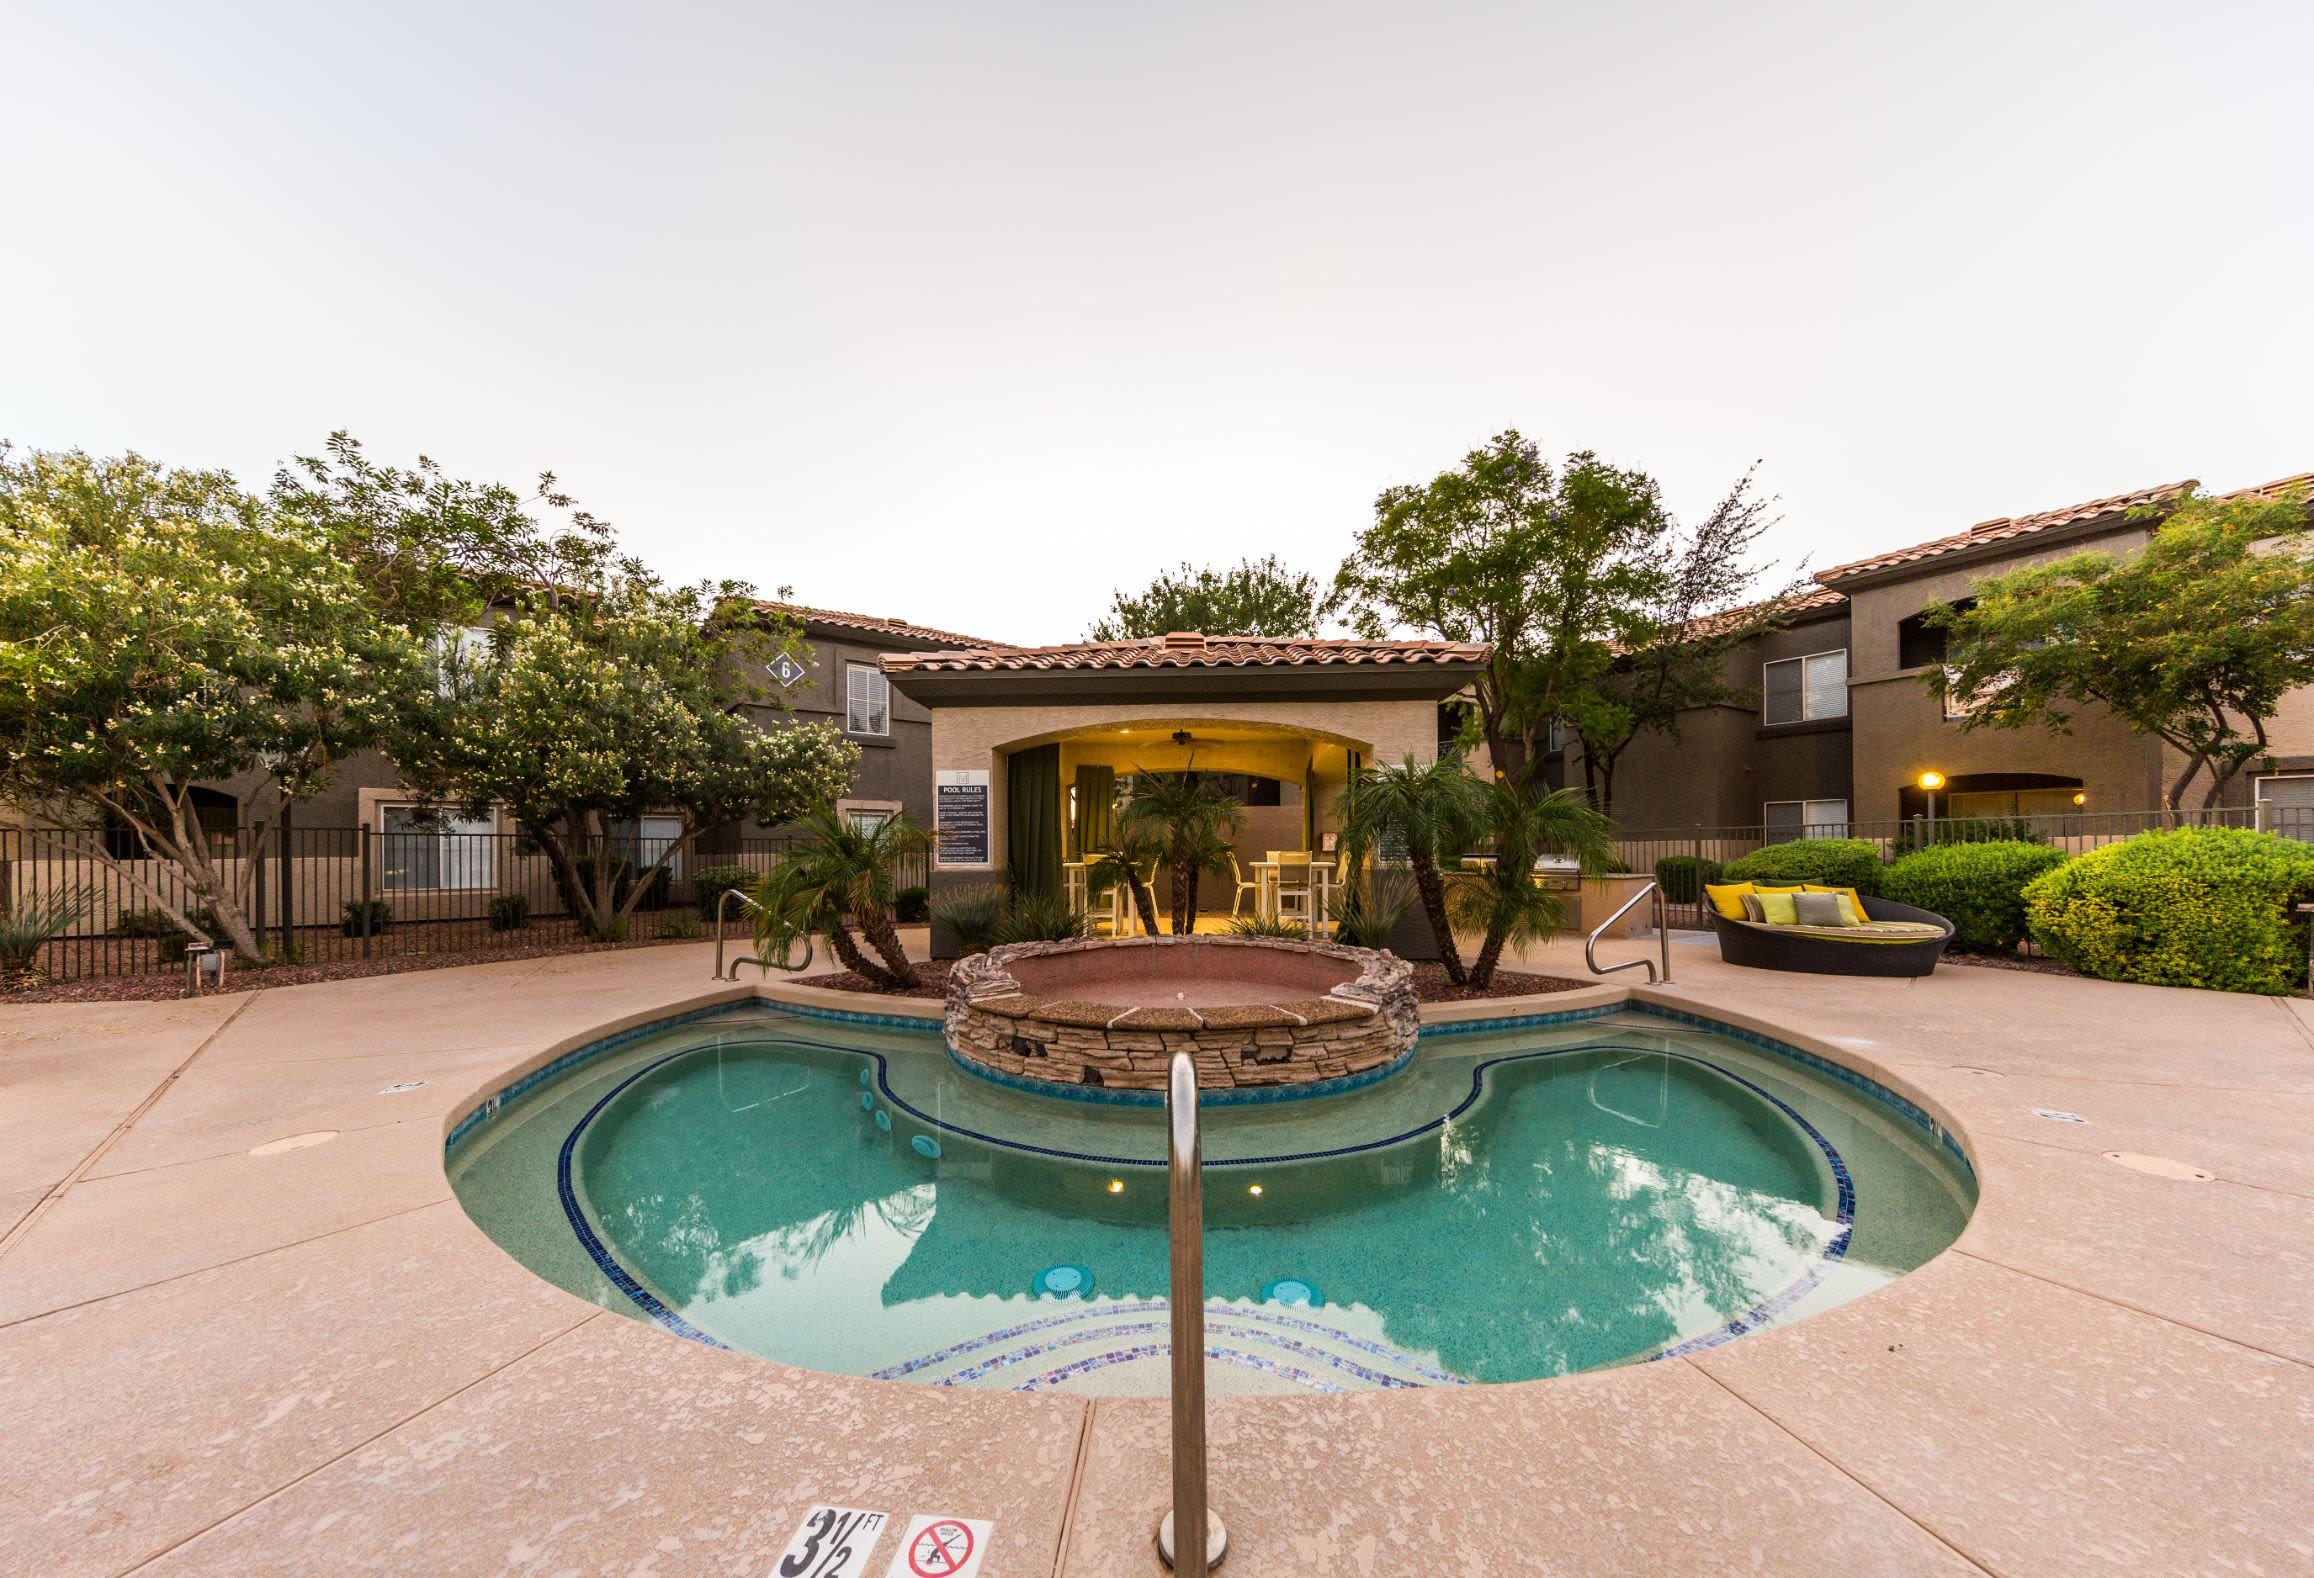 Outdoor spa at Marquis at Arrowhead in Peoria, Arizona